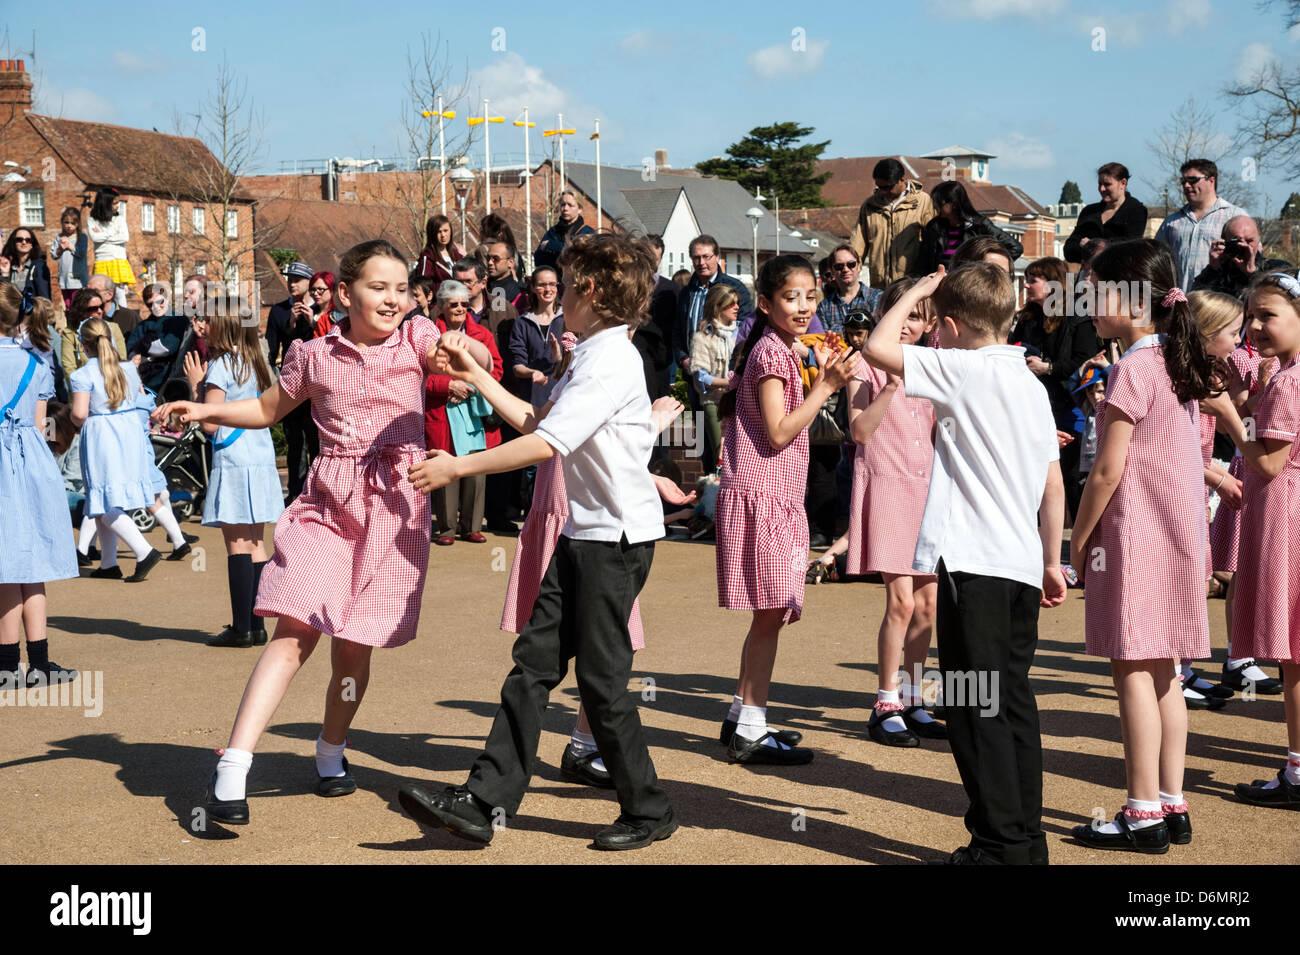 William Shakespeare birthday celebrations in Stratford upon Avon, UK. School children dancing & having fun exercising - Stock Image